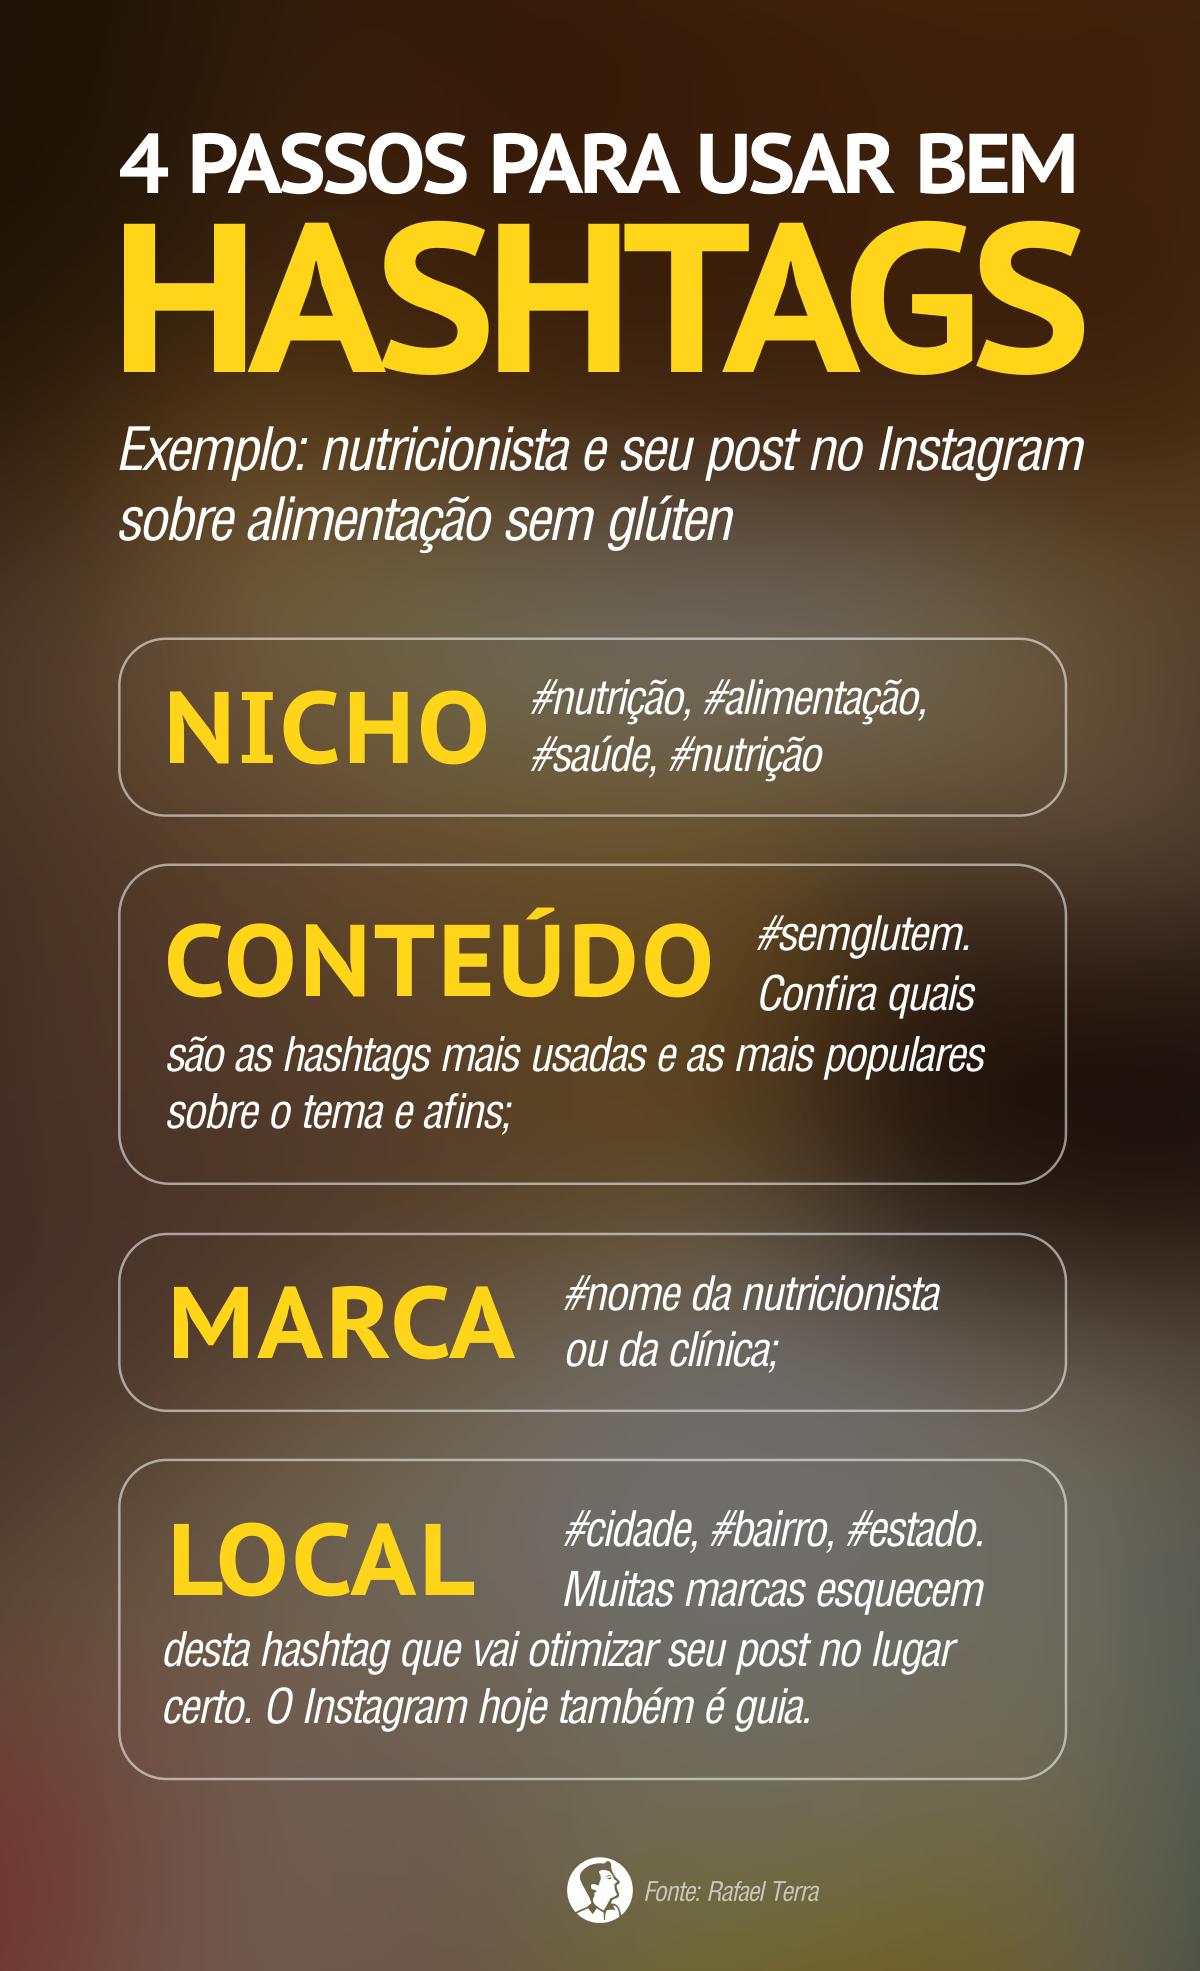 4 passos para usar bem hashtags